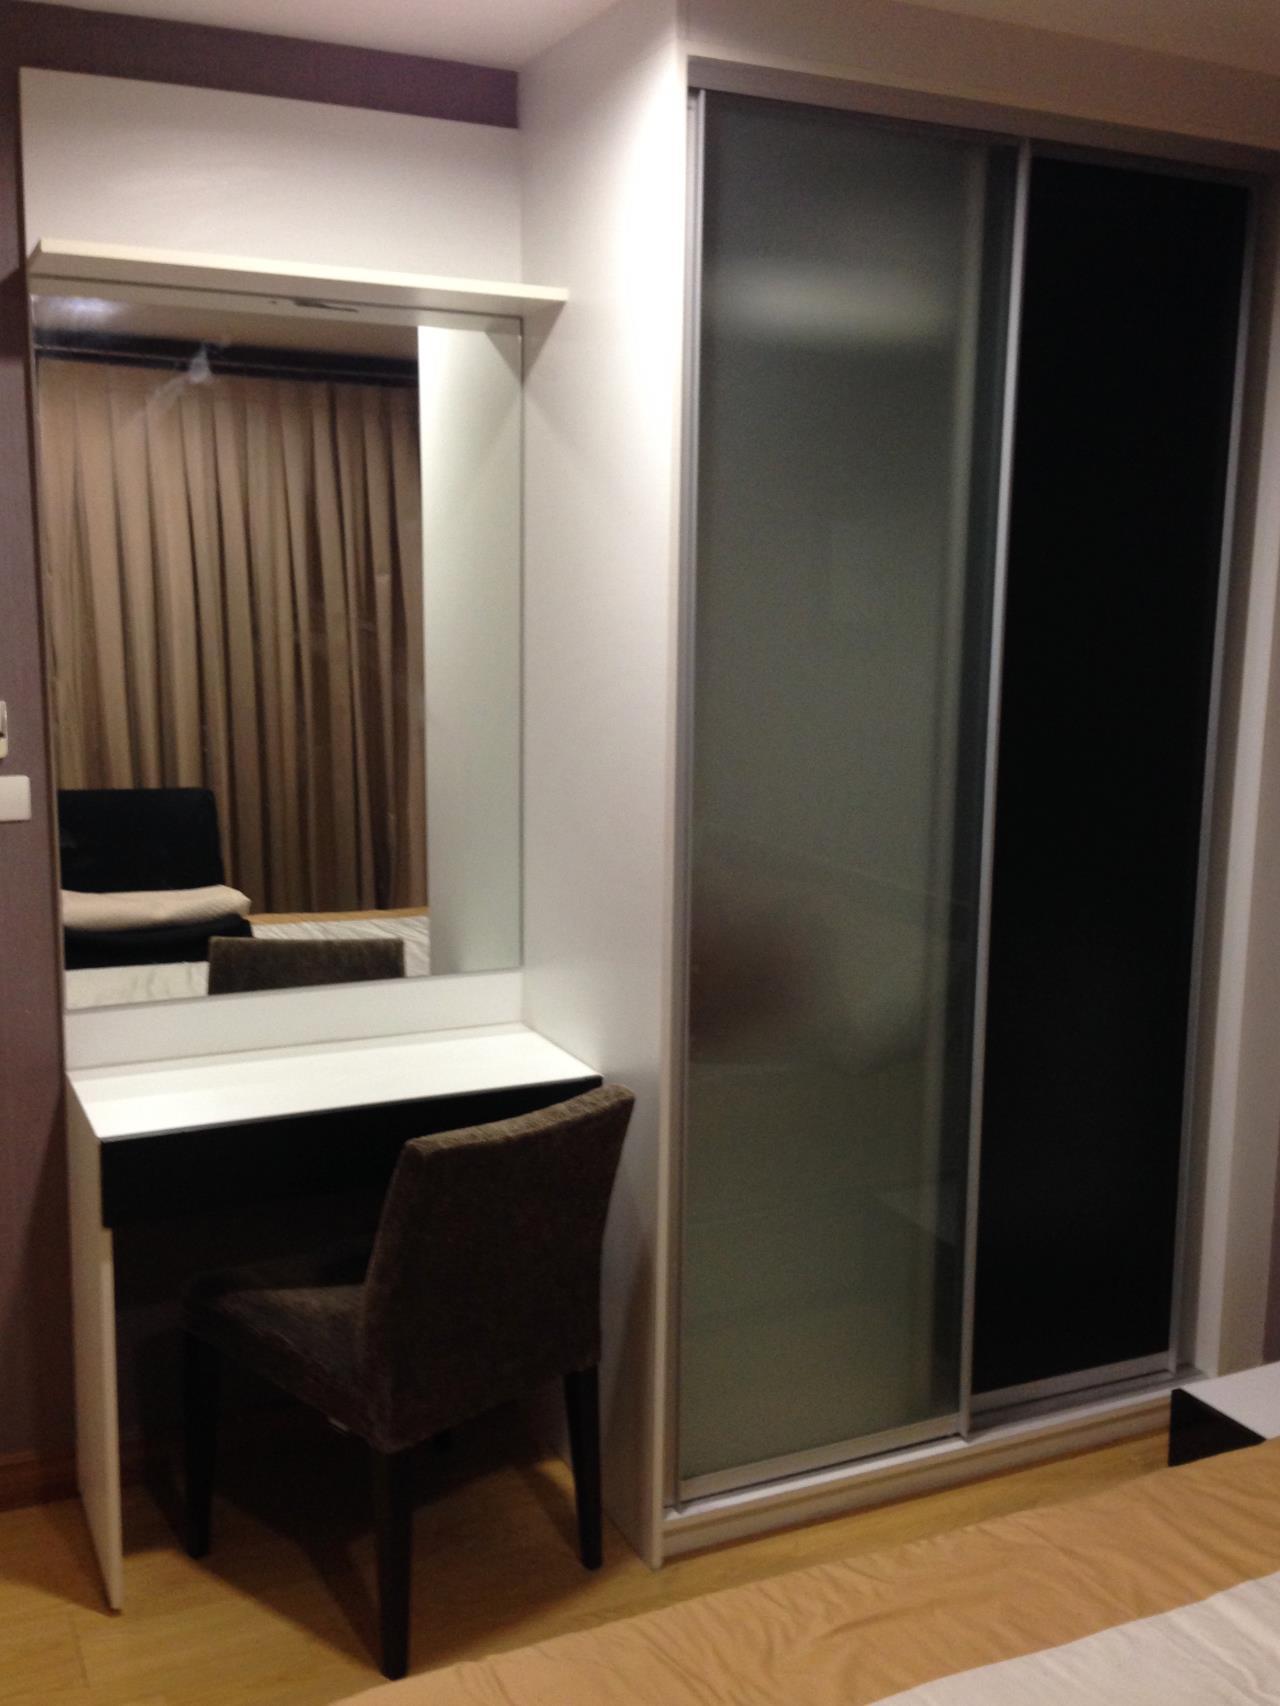 RE/MAX BestLife Agency's Link 5 Rent 2 Bedroom Duplex On Nut 13352180317 8